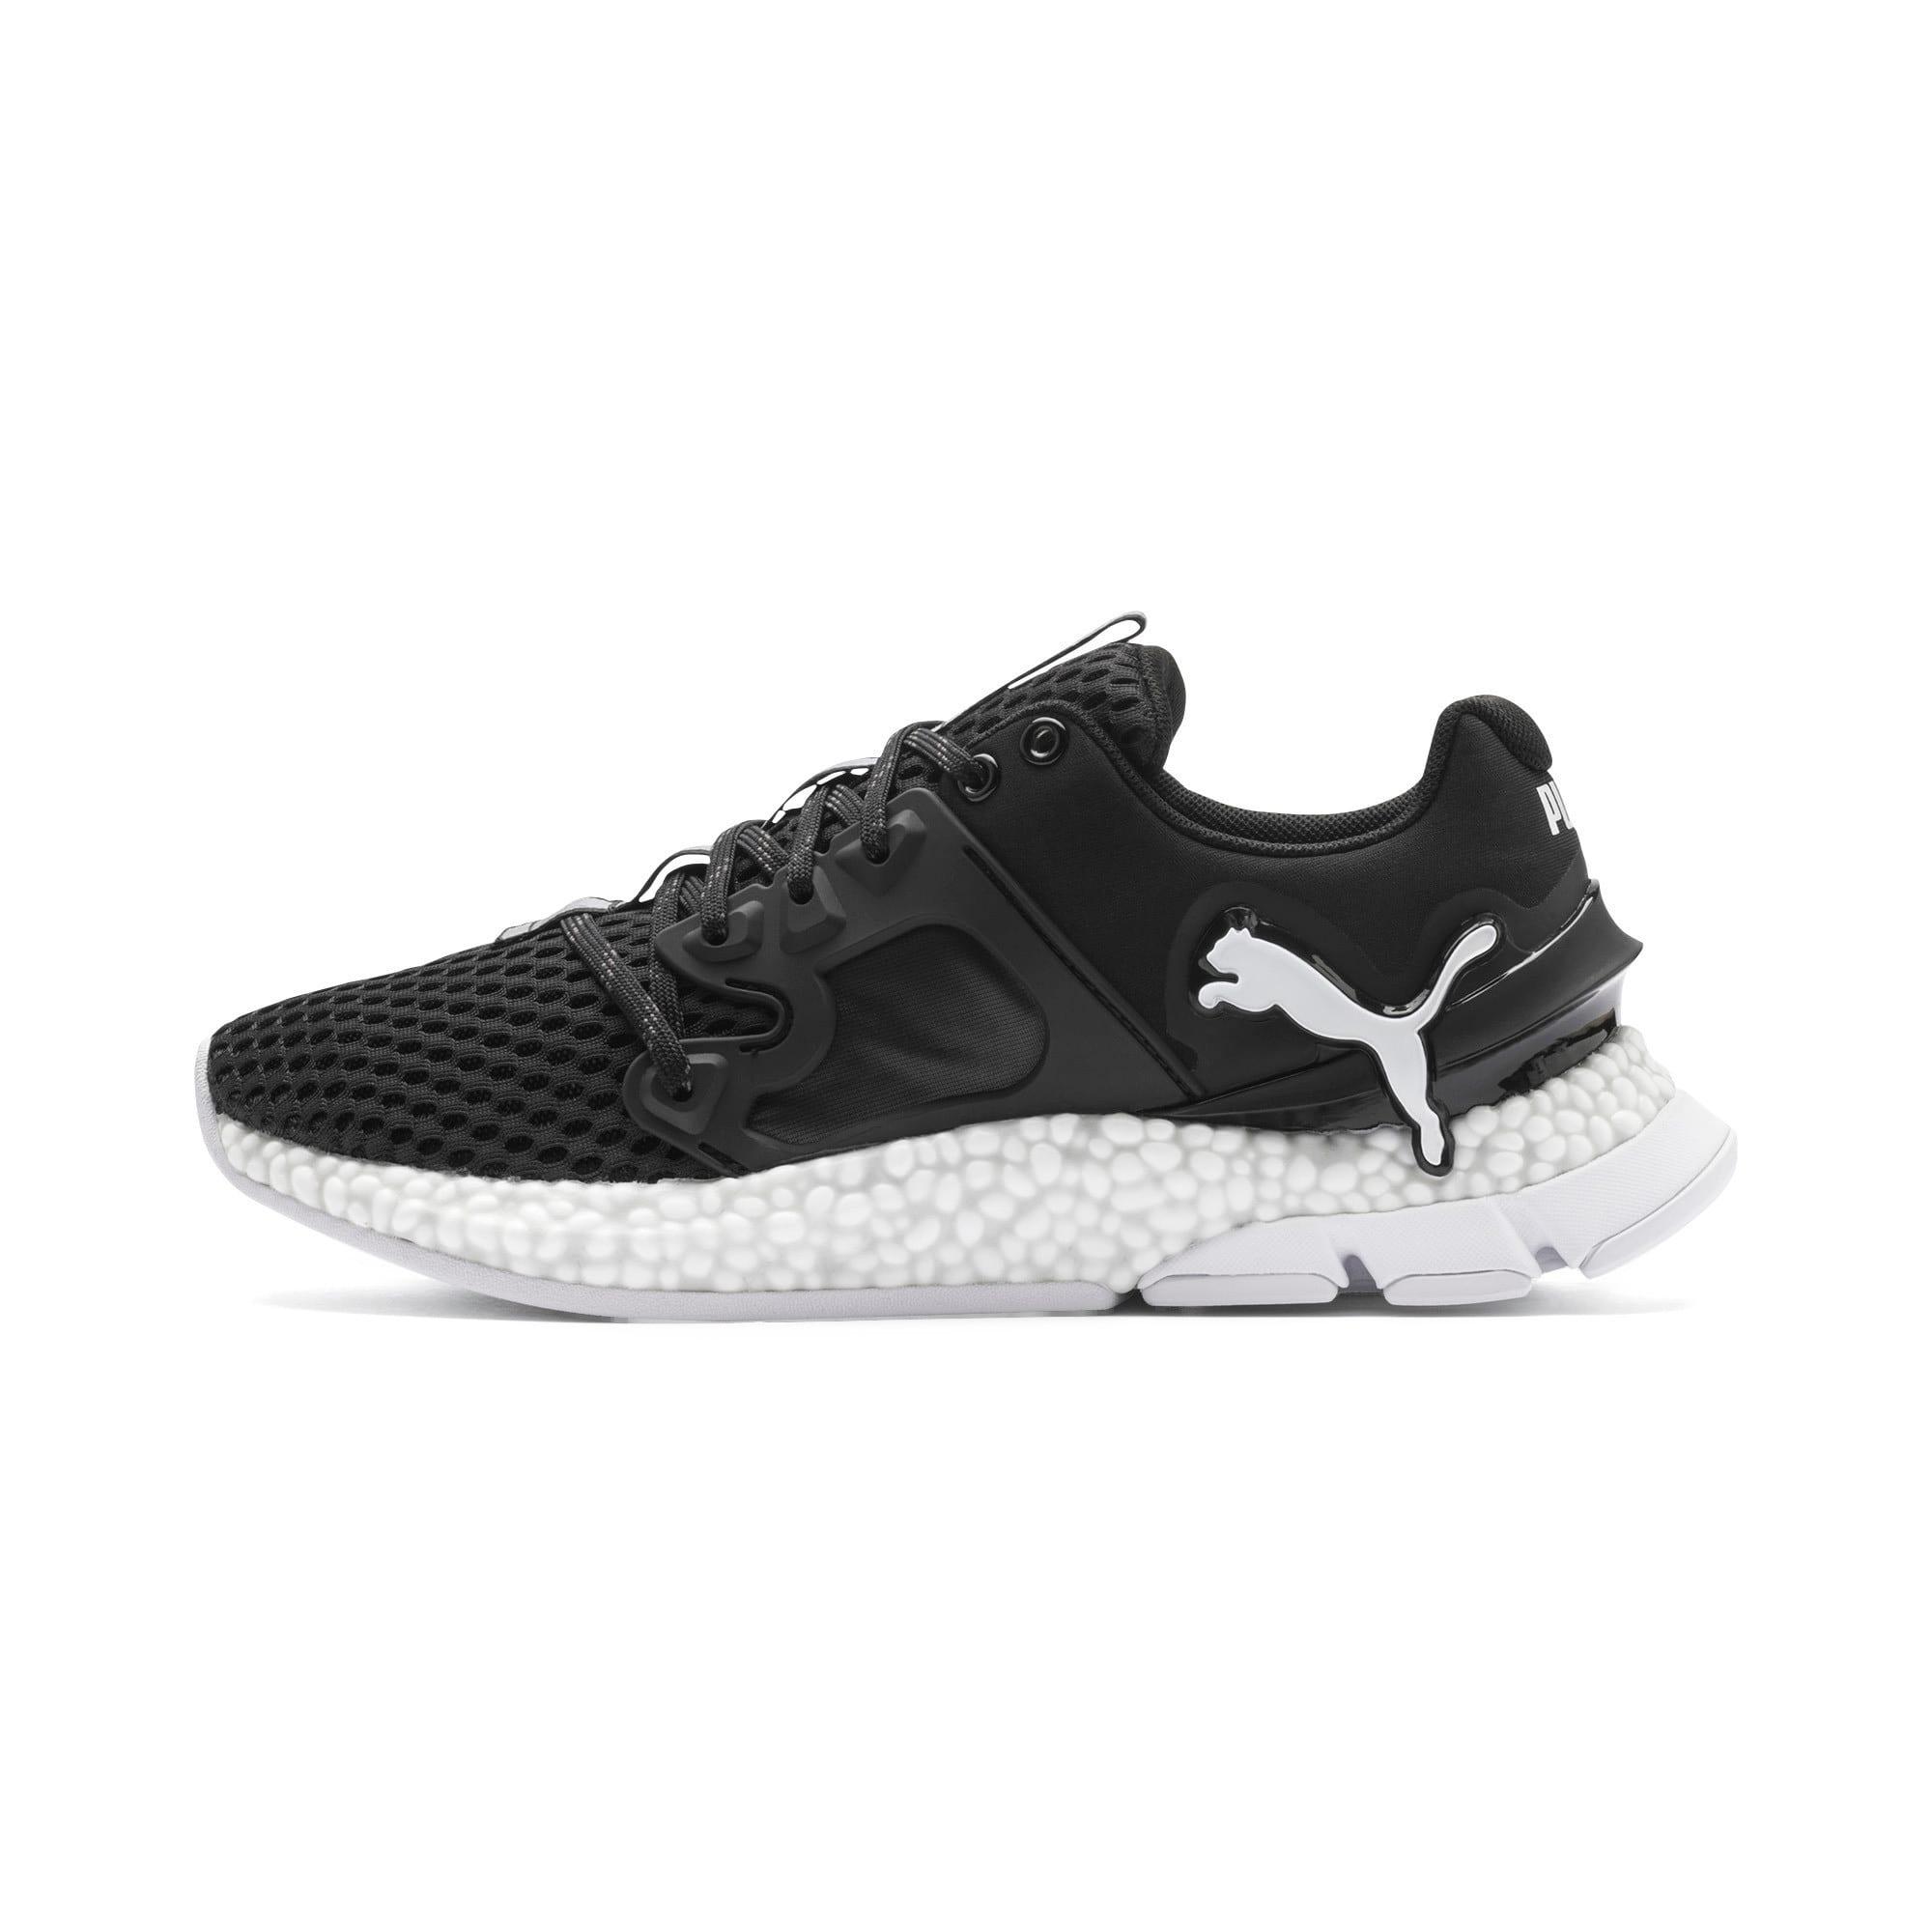 Thumbnail 1 of HYBRID Sky Women's Running Shoes, Puma Black-Puma White, medium